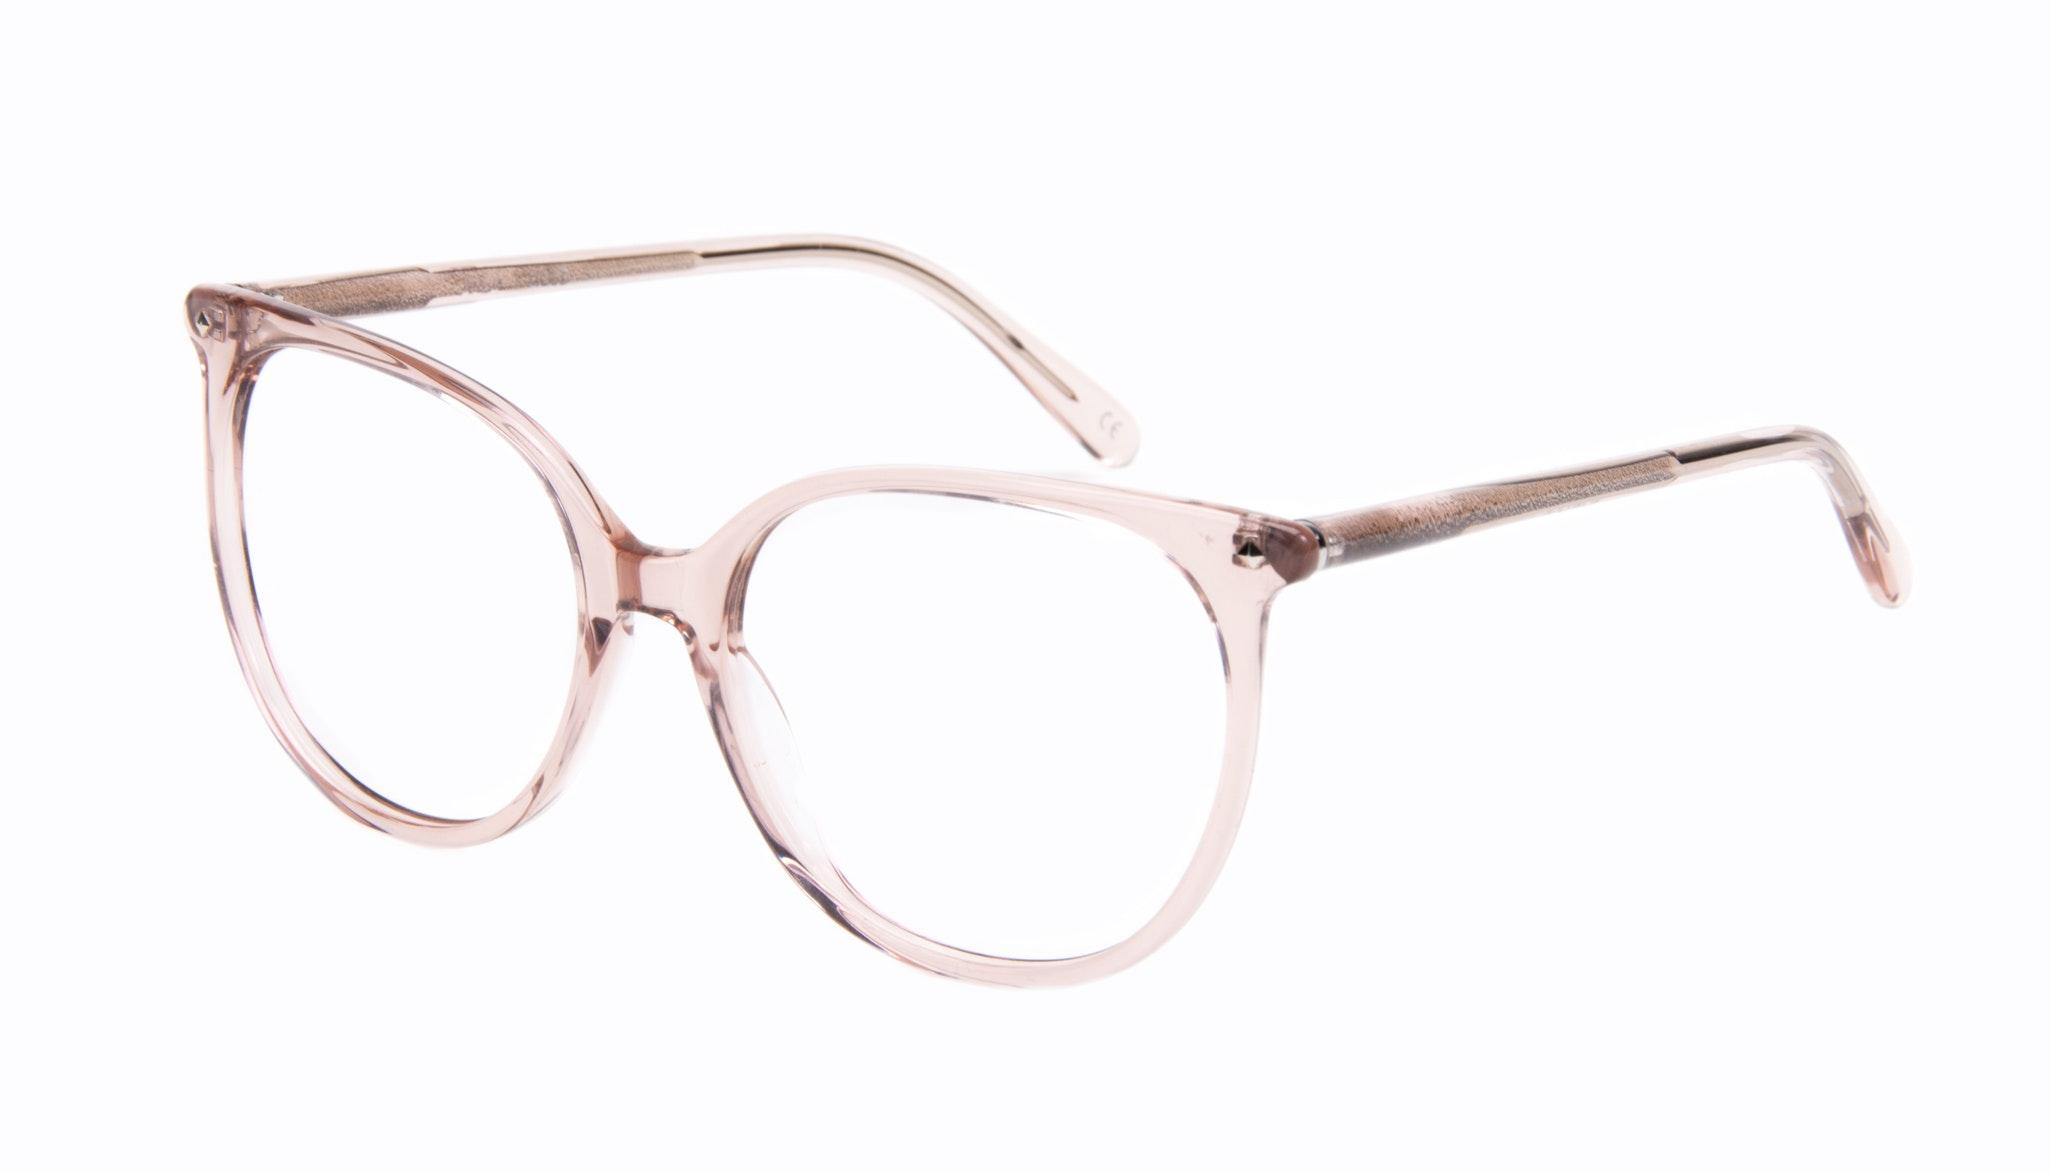 Affordable Fashion Glasses Cat Eye Square Eyeglasses Women Area Rose Tilt